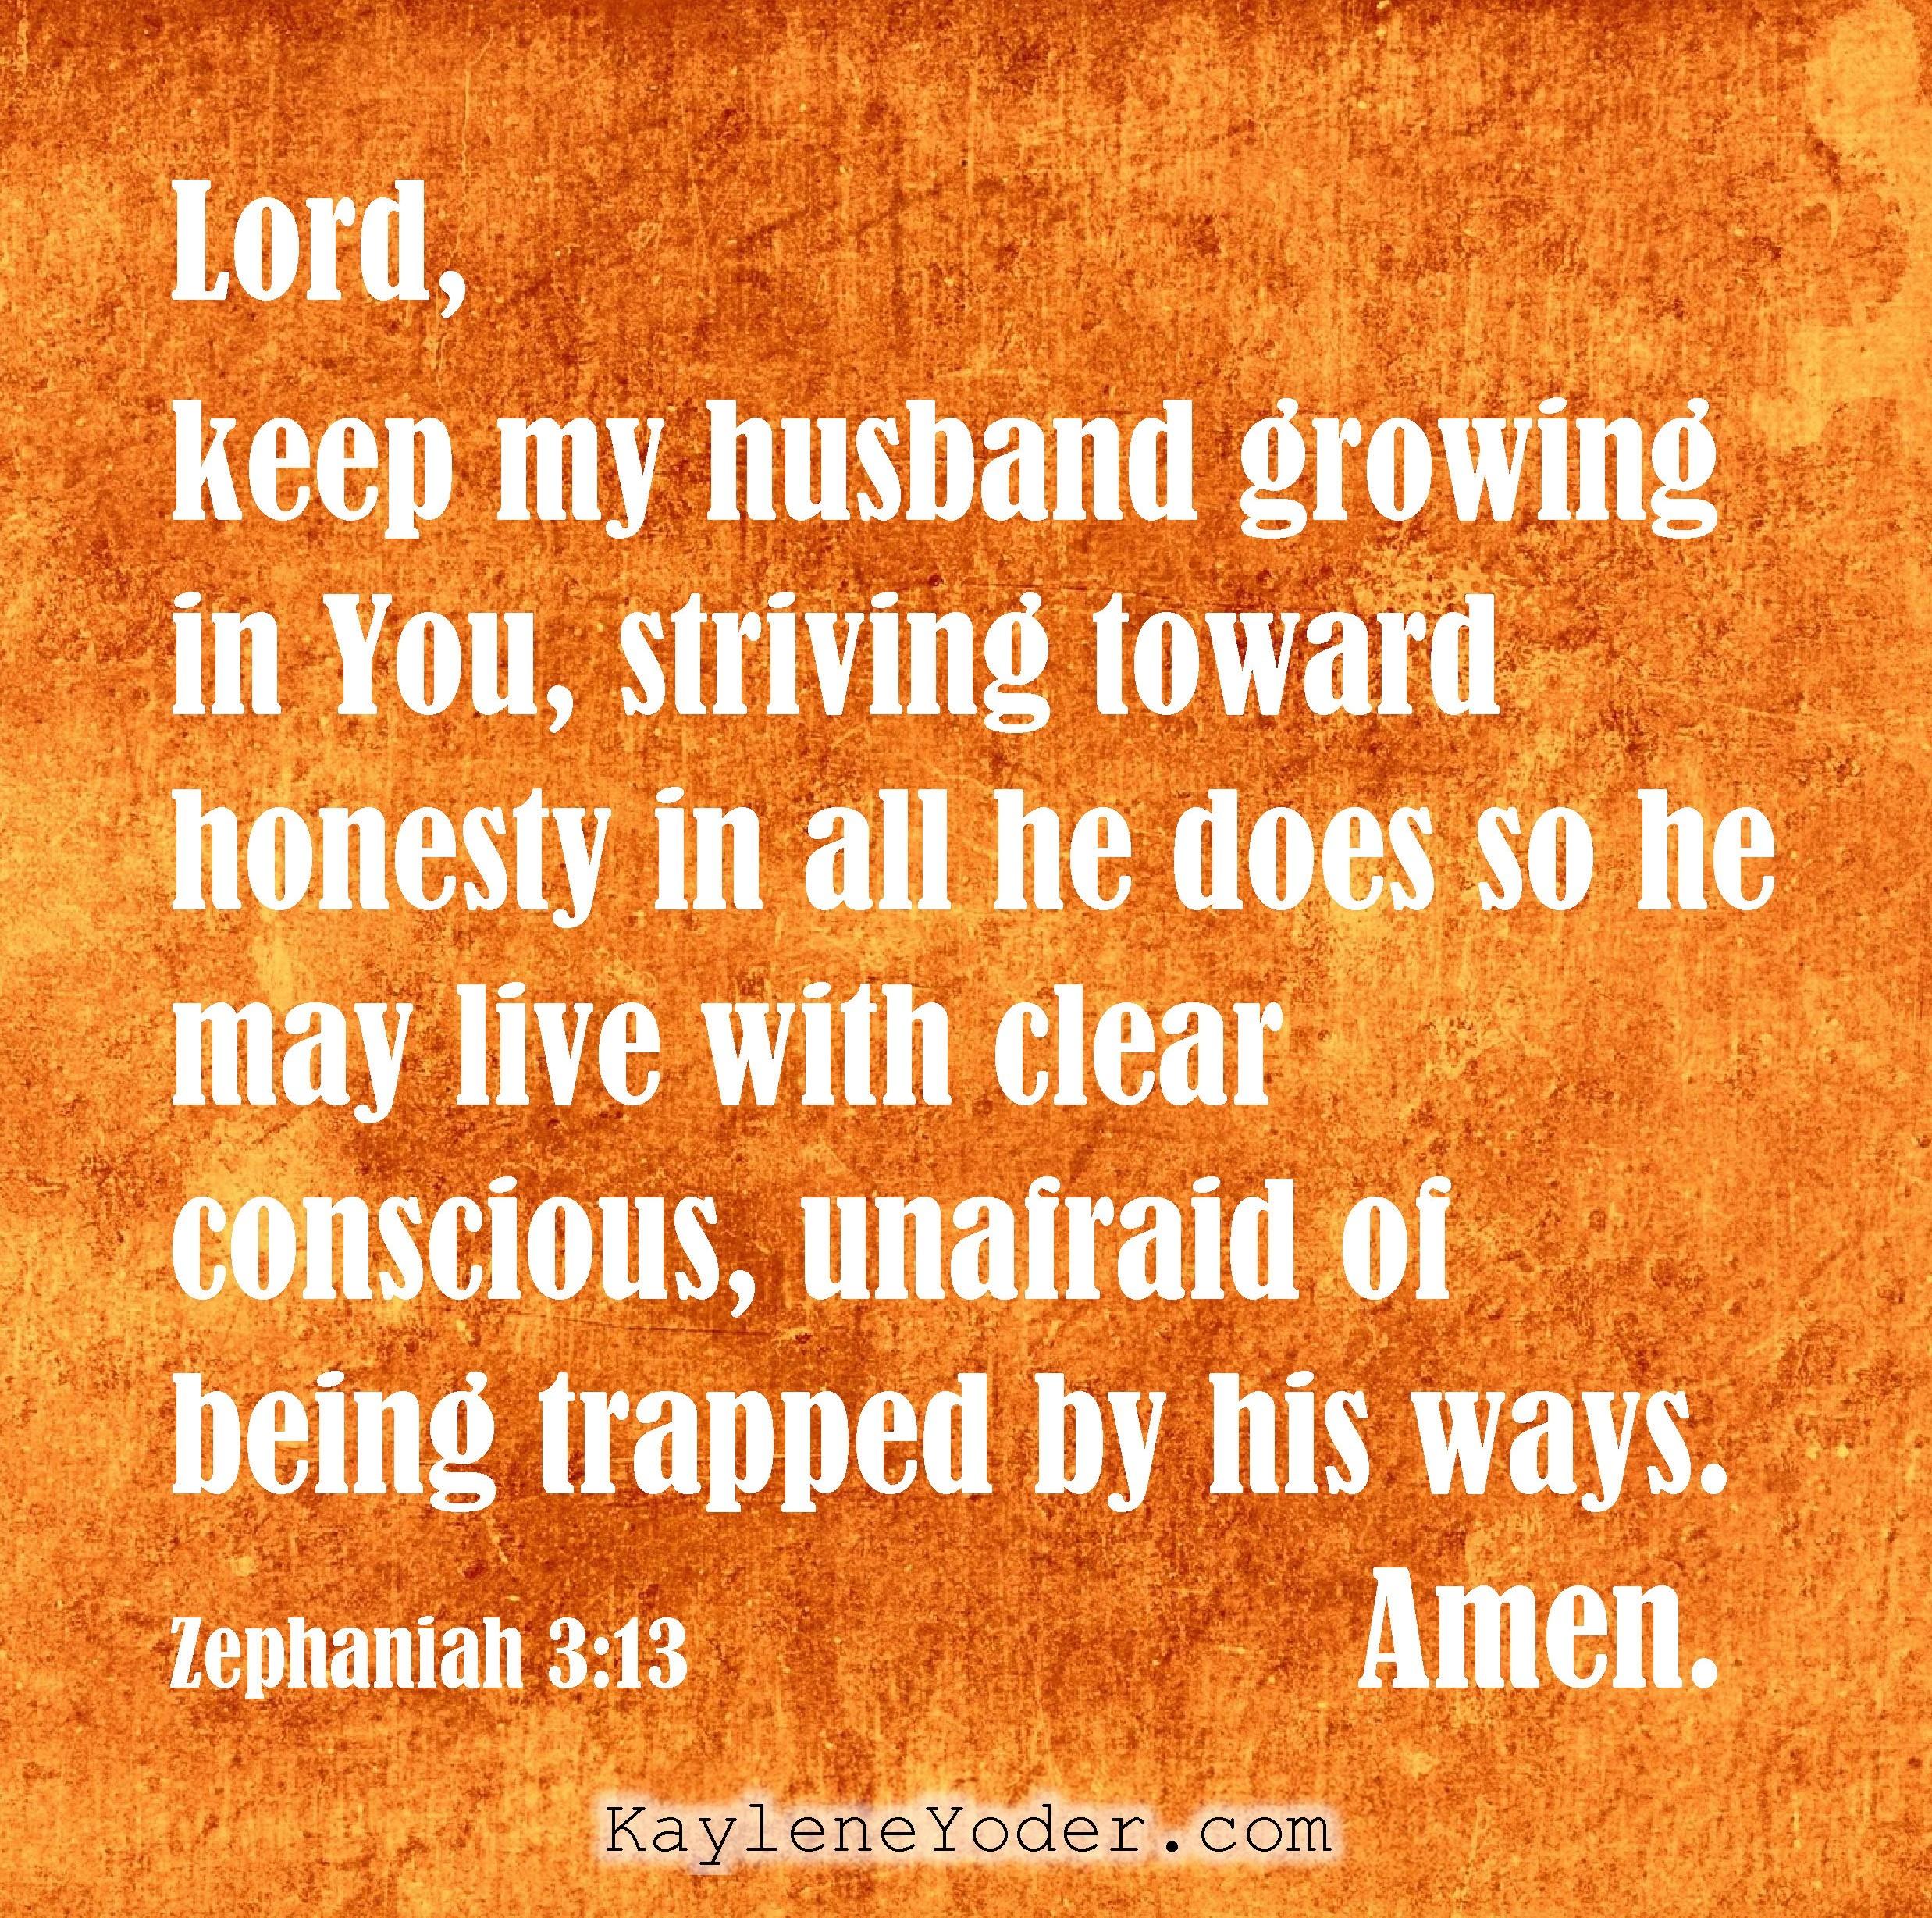 A Prayer for Your Husband's Honesty - Kaylene Yoder